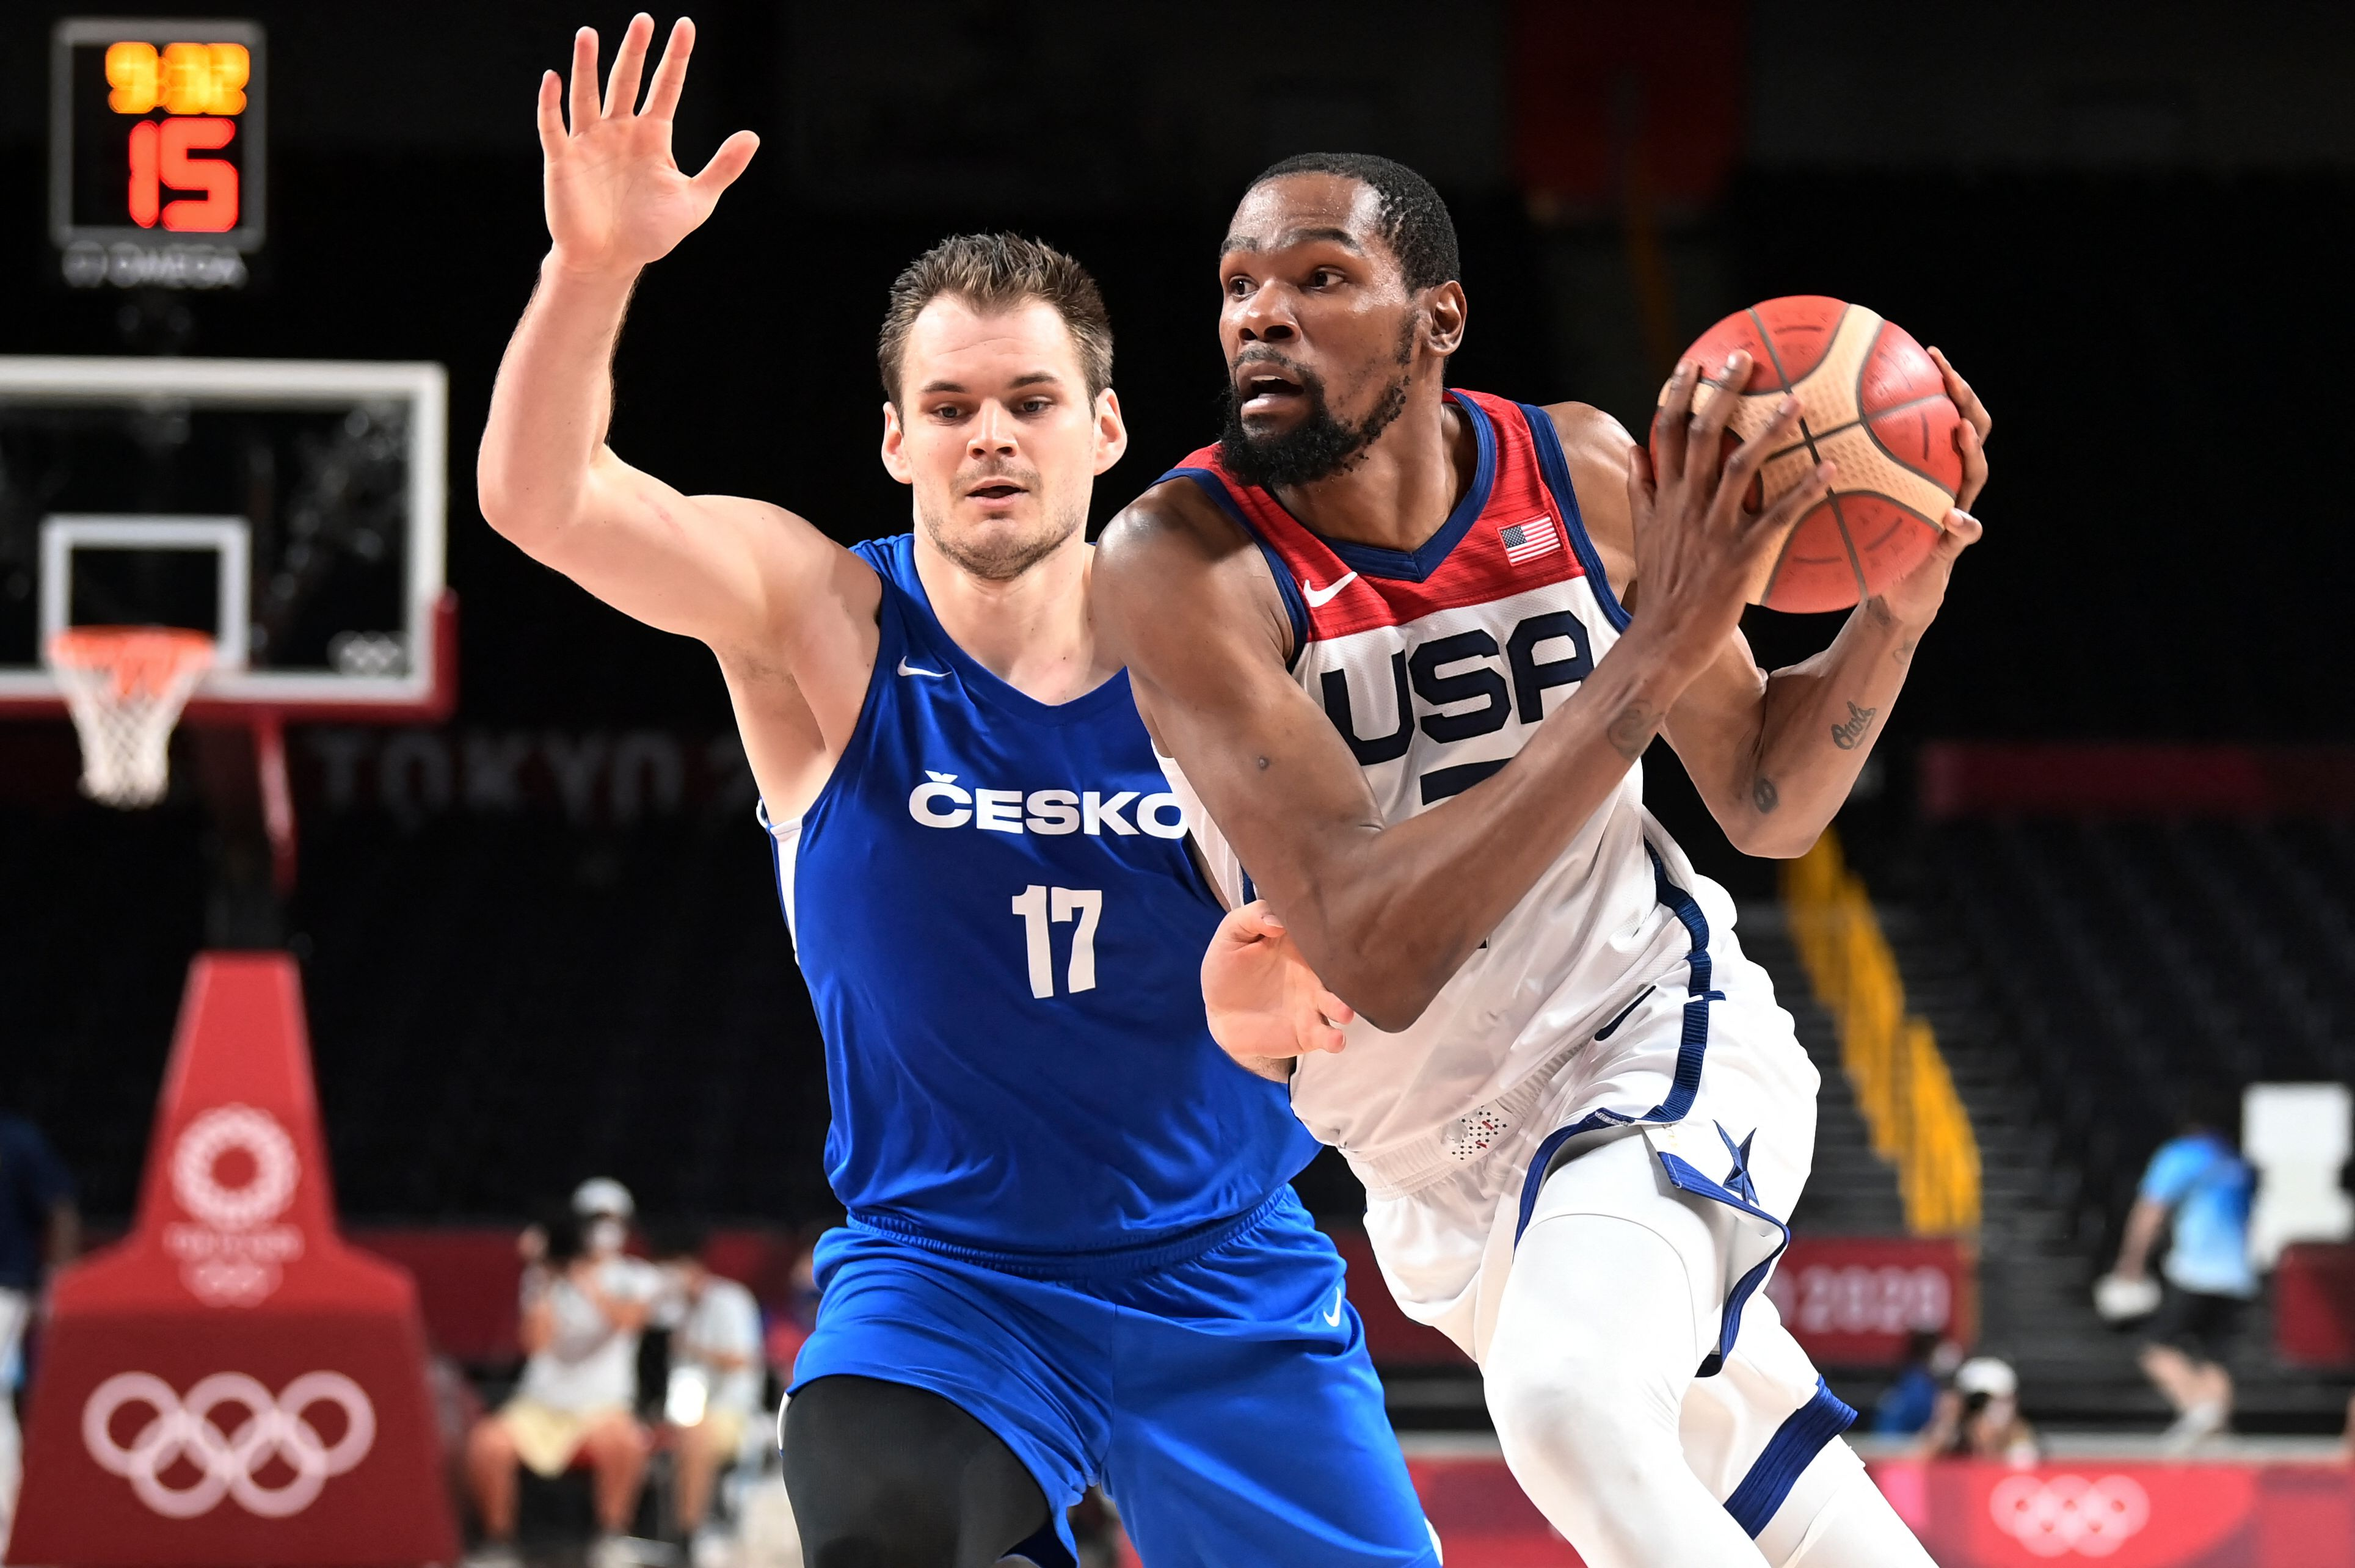 BASKETBALL-OLY-2020-2021-TOKYO-USA-CZE